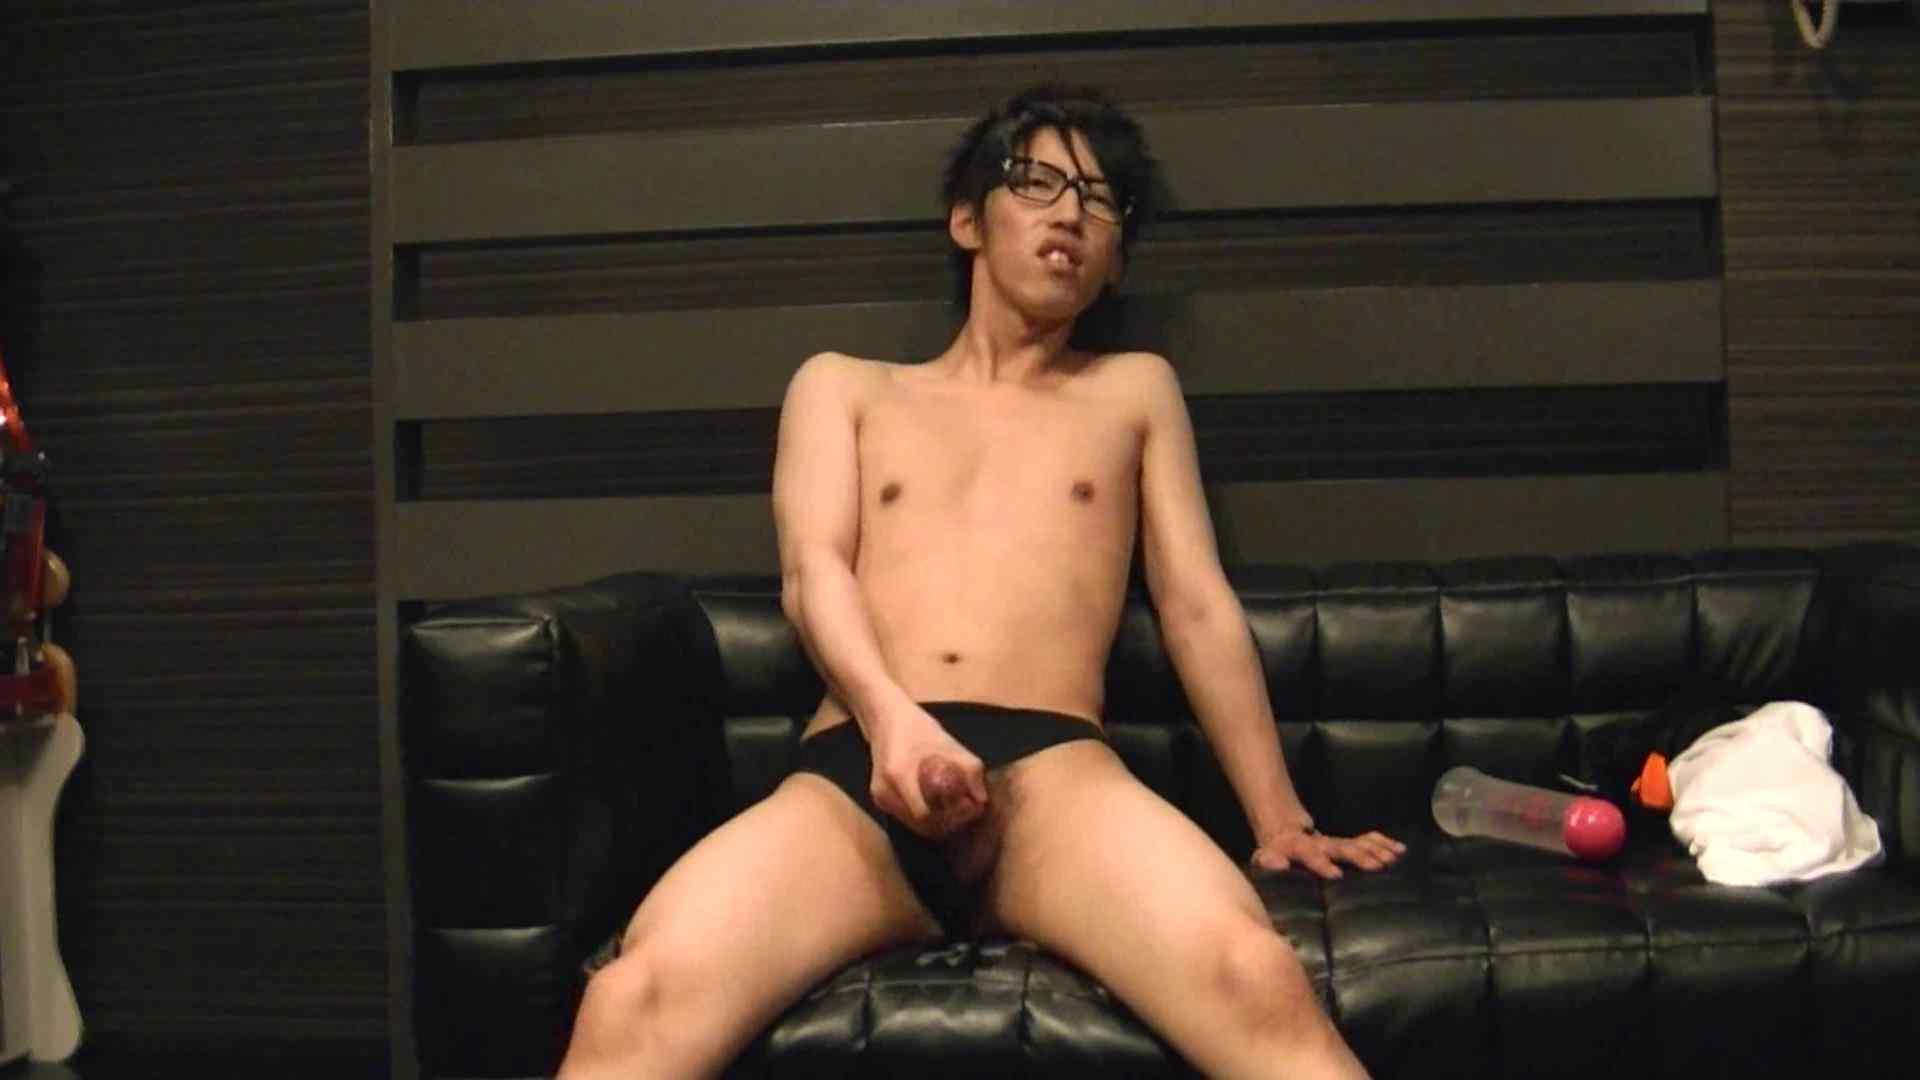 ONA見せカーニバル!! Vol3 男 ゲイ無料無修正画像 89枚 16